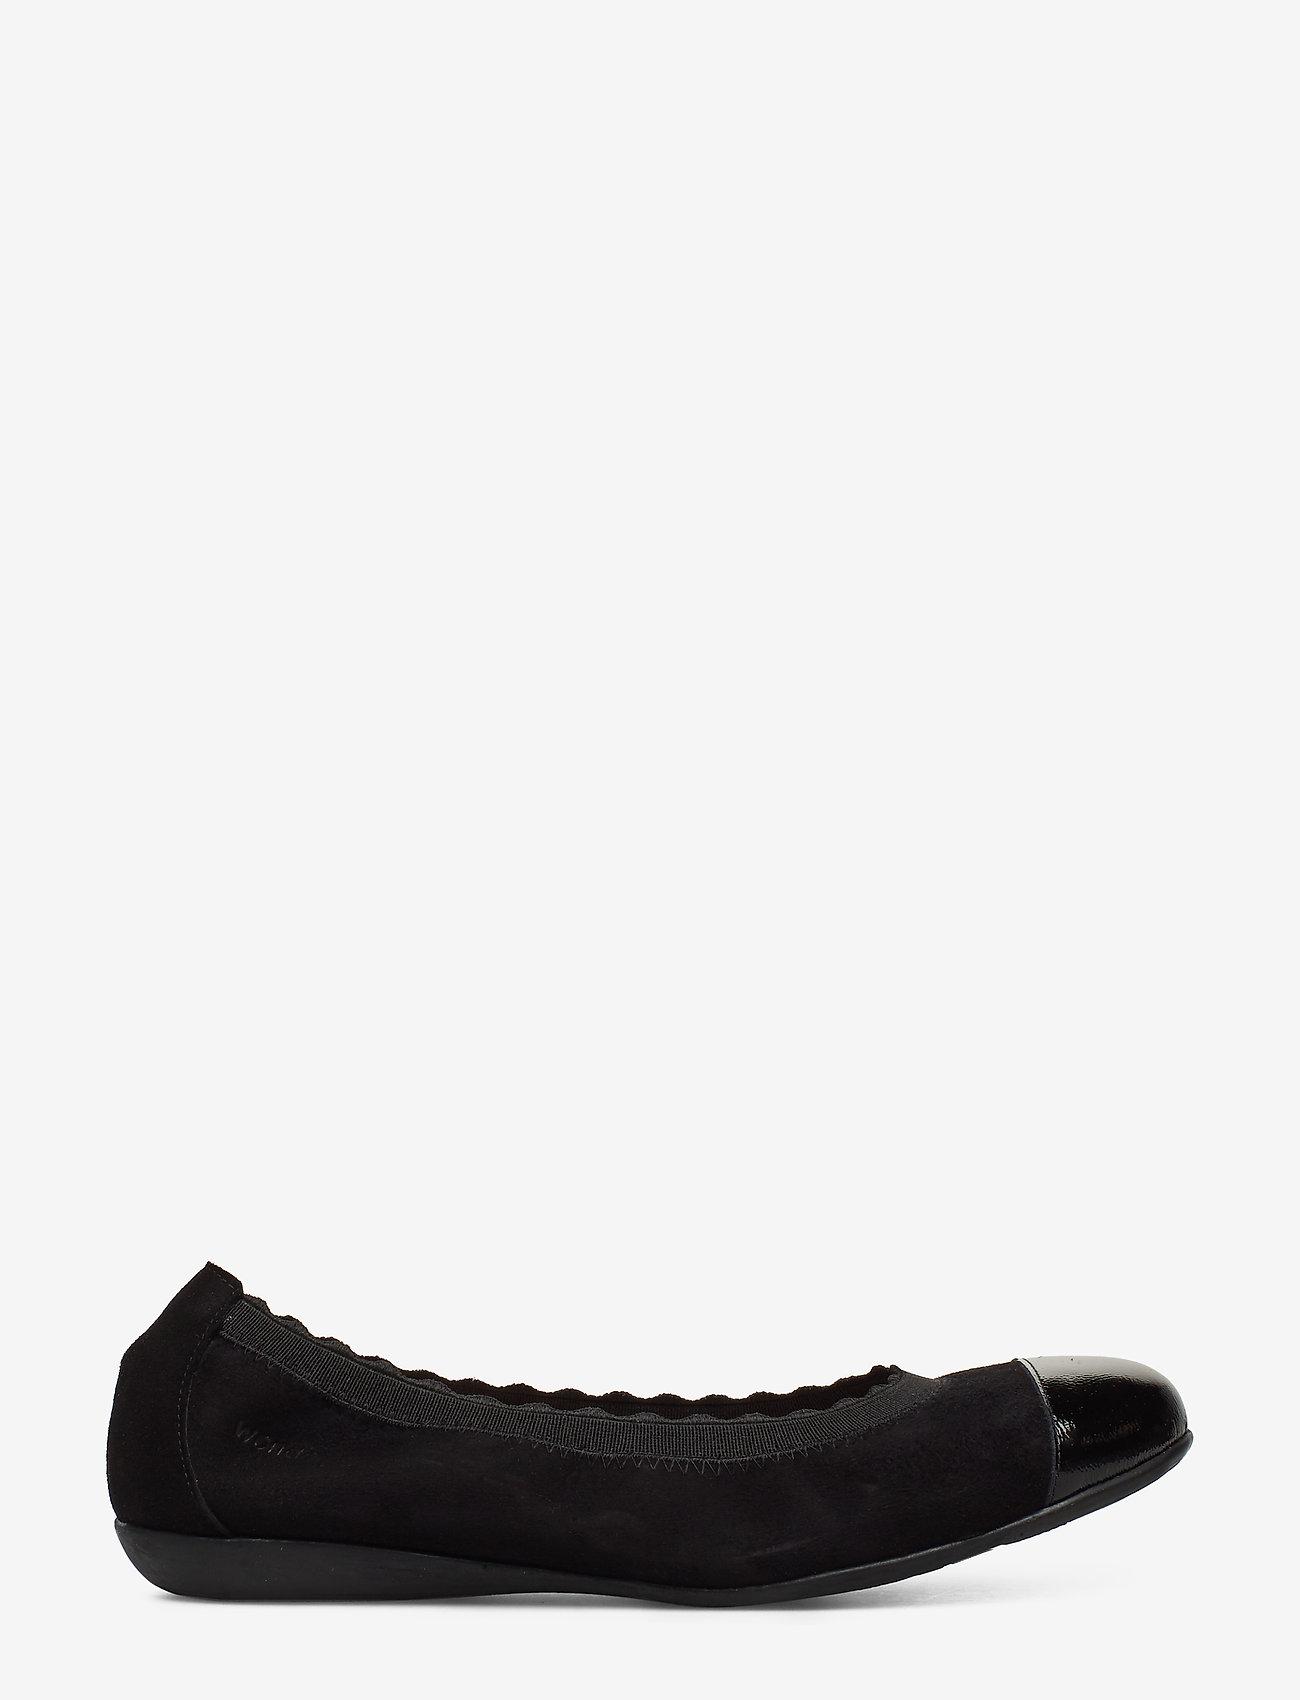 Wonders - A-6170 - loafers - black - 1